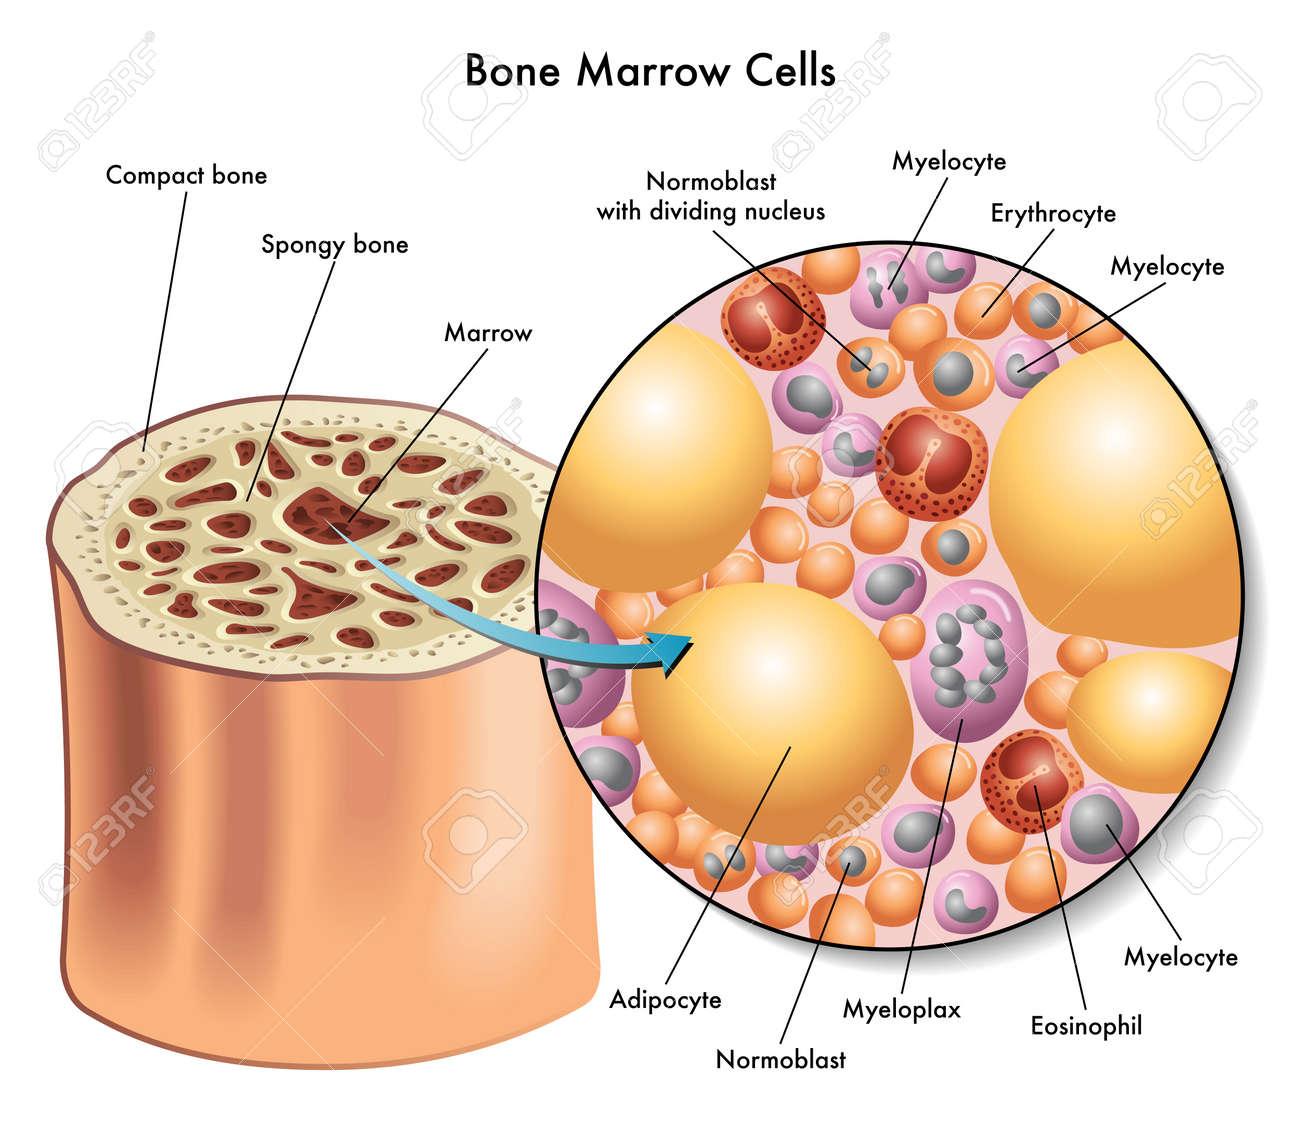 bone marrow cells - 27490936